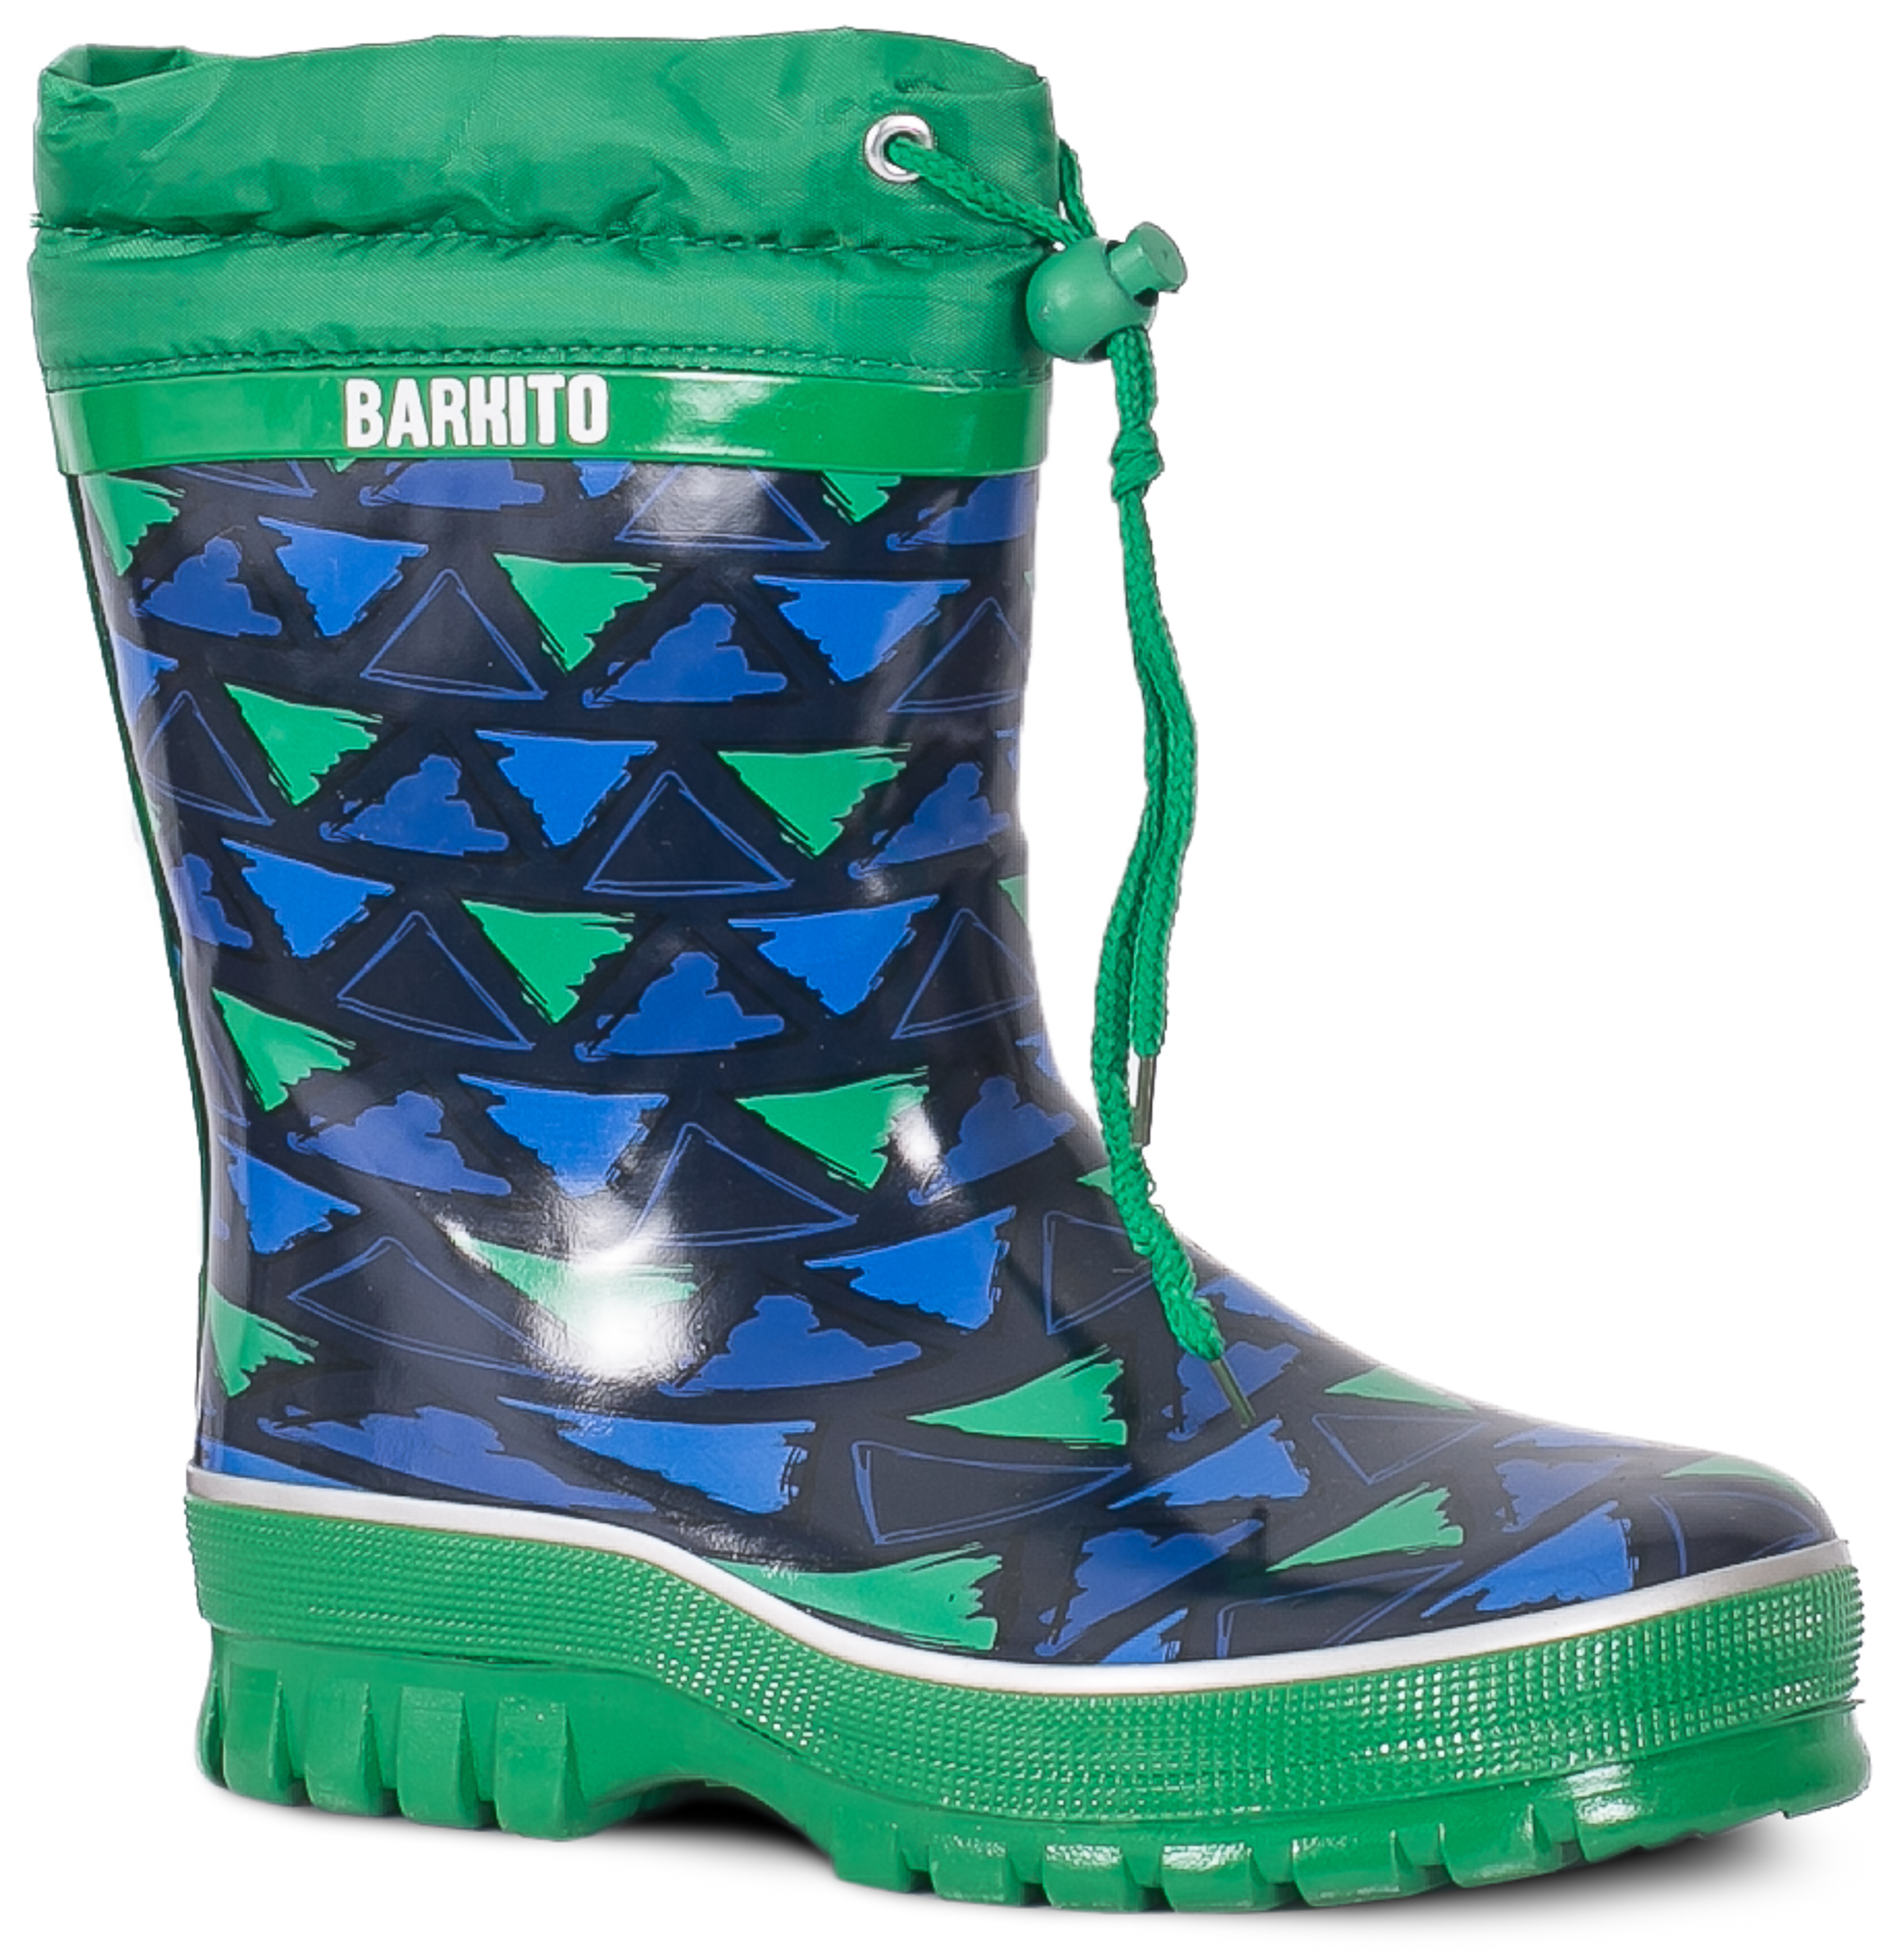 Резиновые сапоги Barkito для мальчика резиновые сапоги для мальчика barkito krw18107